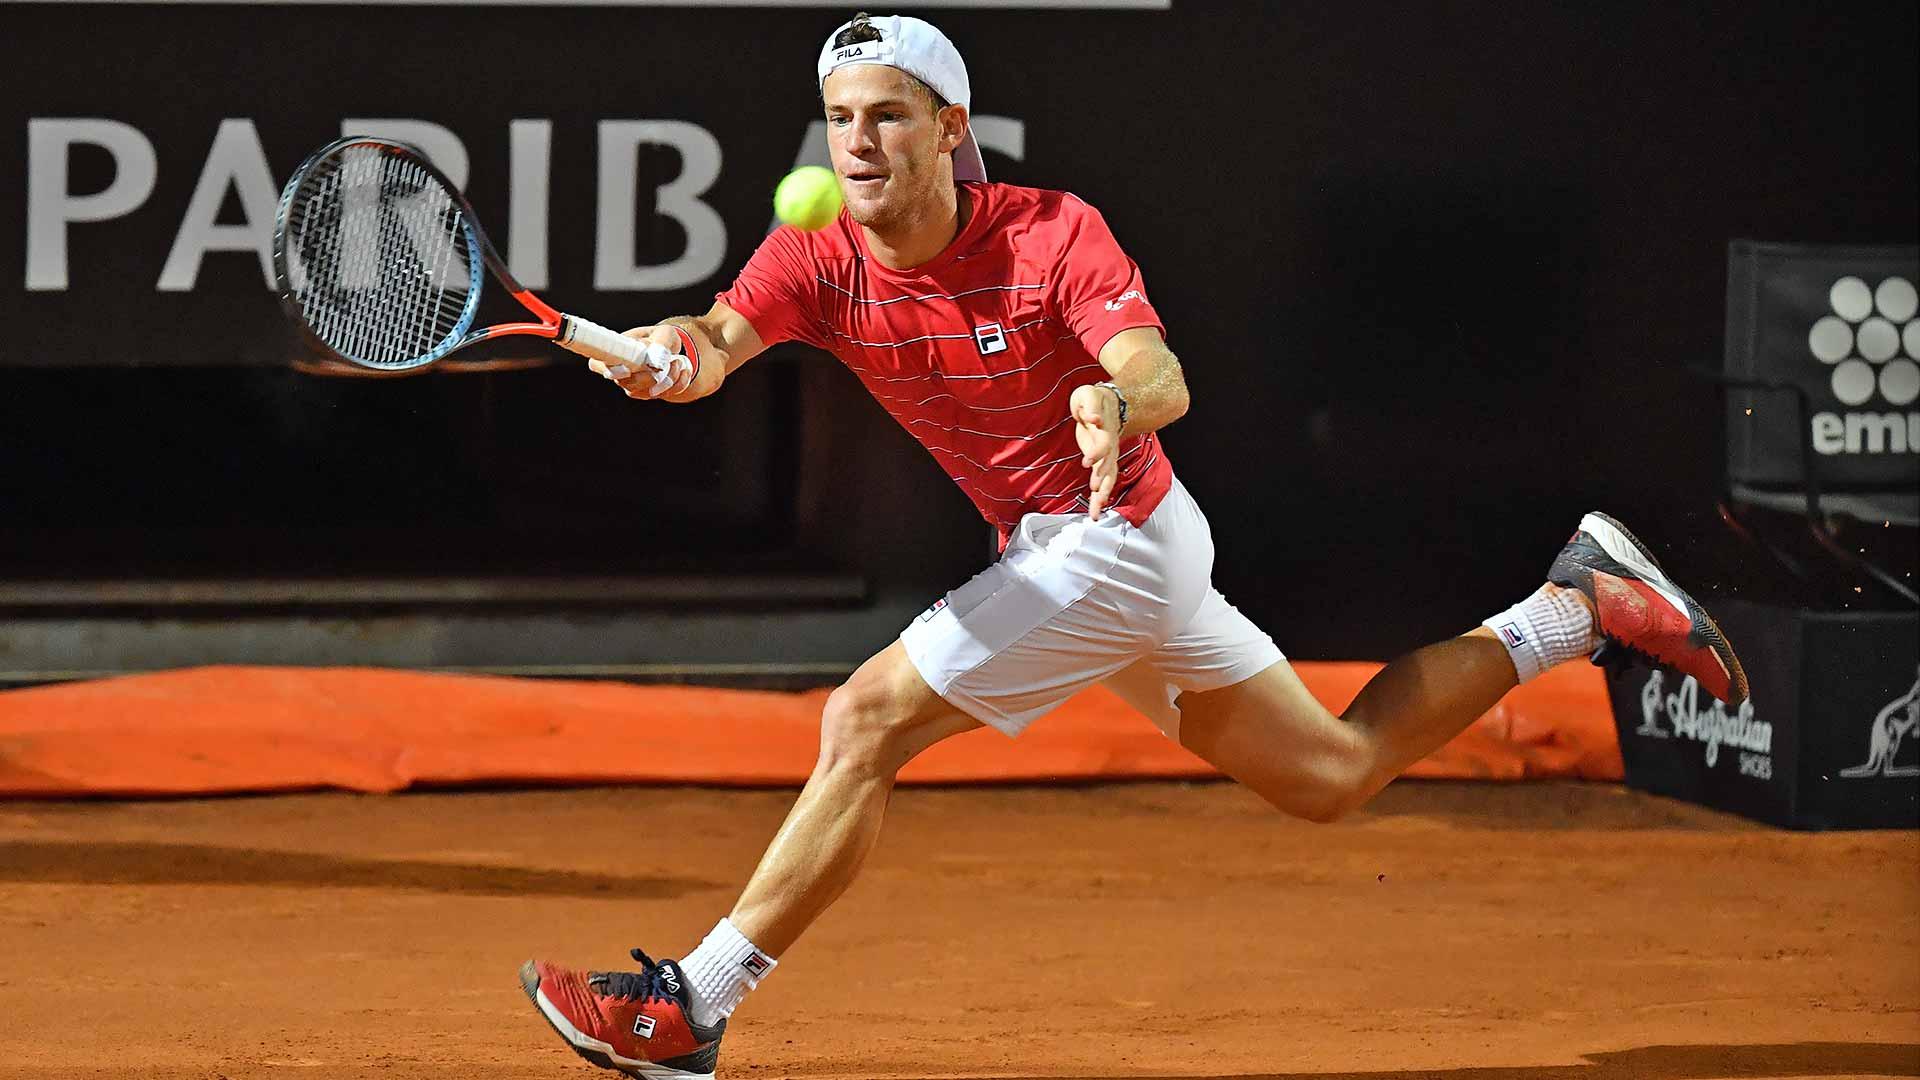 Diego Schwartzman Shines Against Denis Shapovalov In Rome Reaches Maiden Masters 1000 Final Atp Tour Tennis